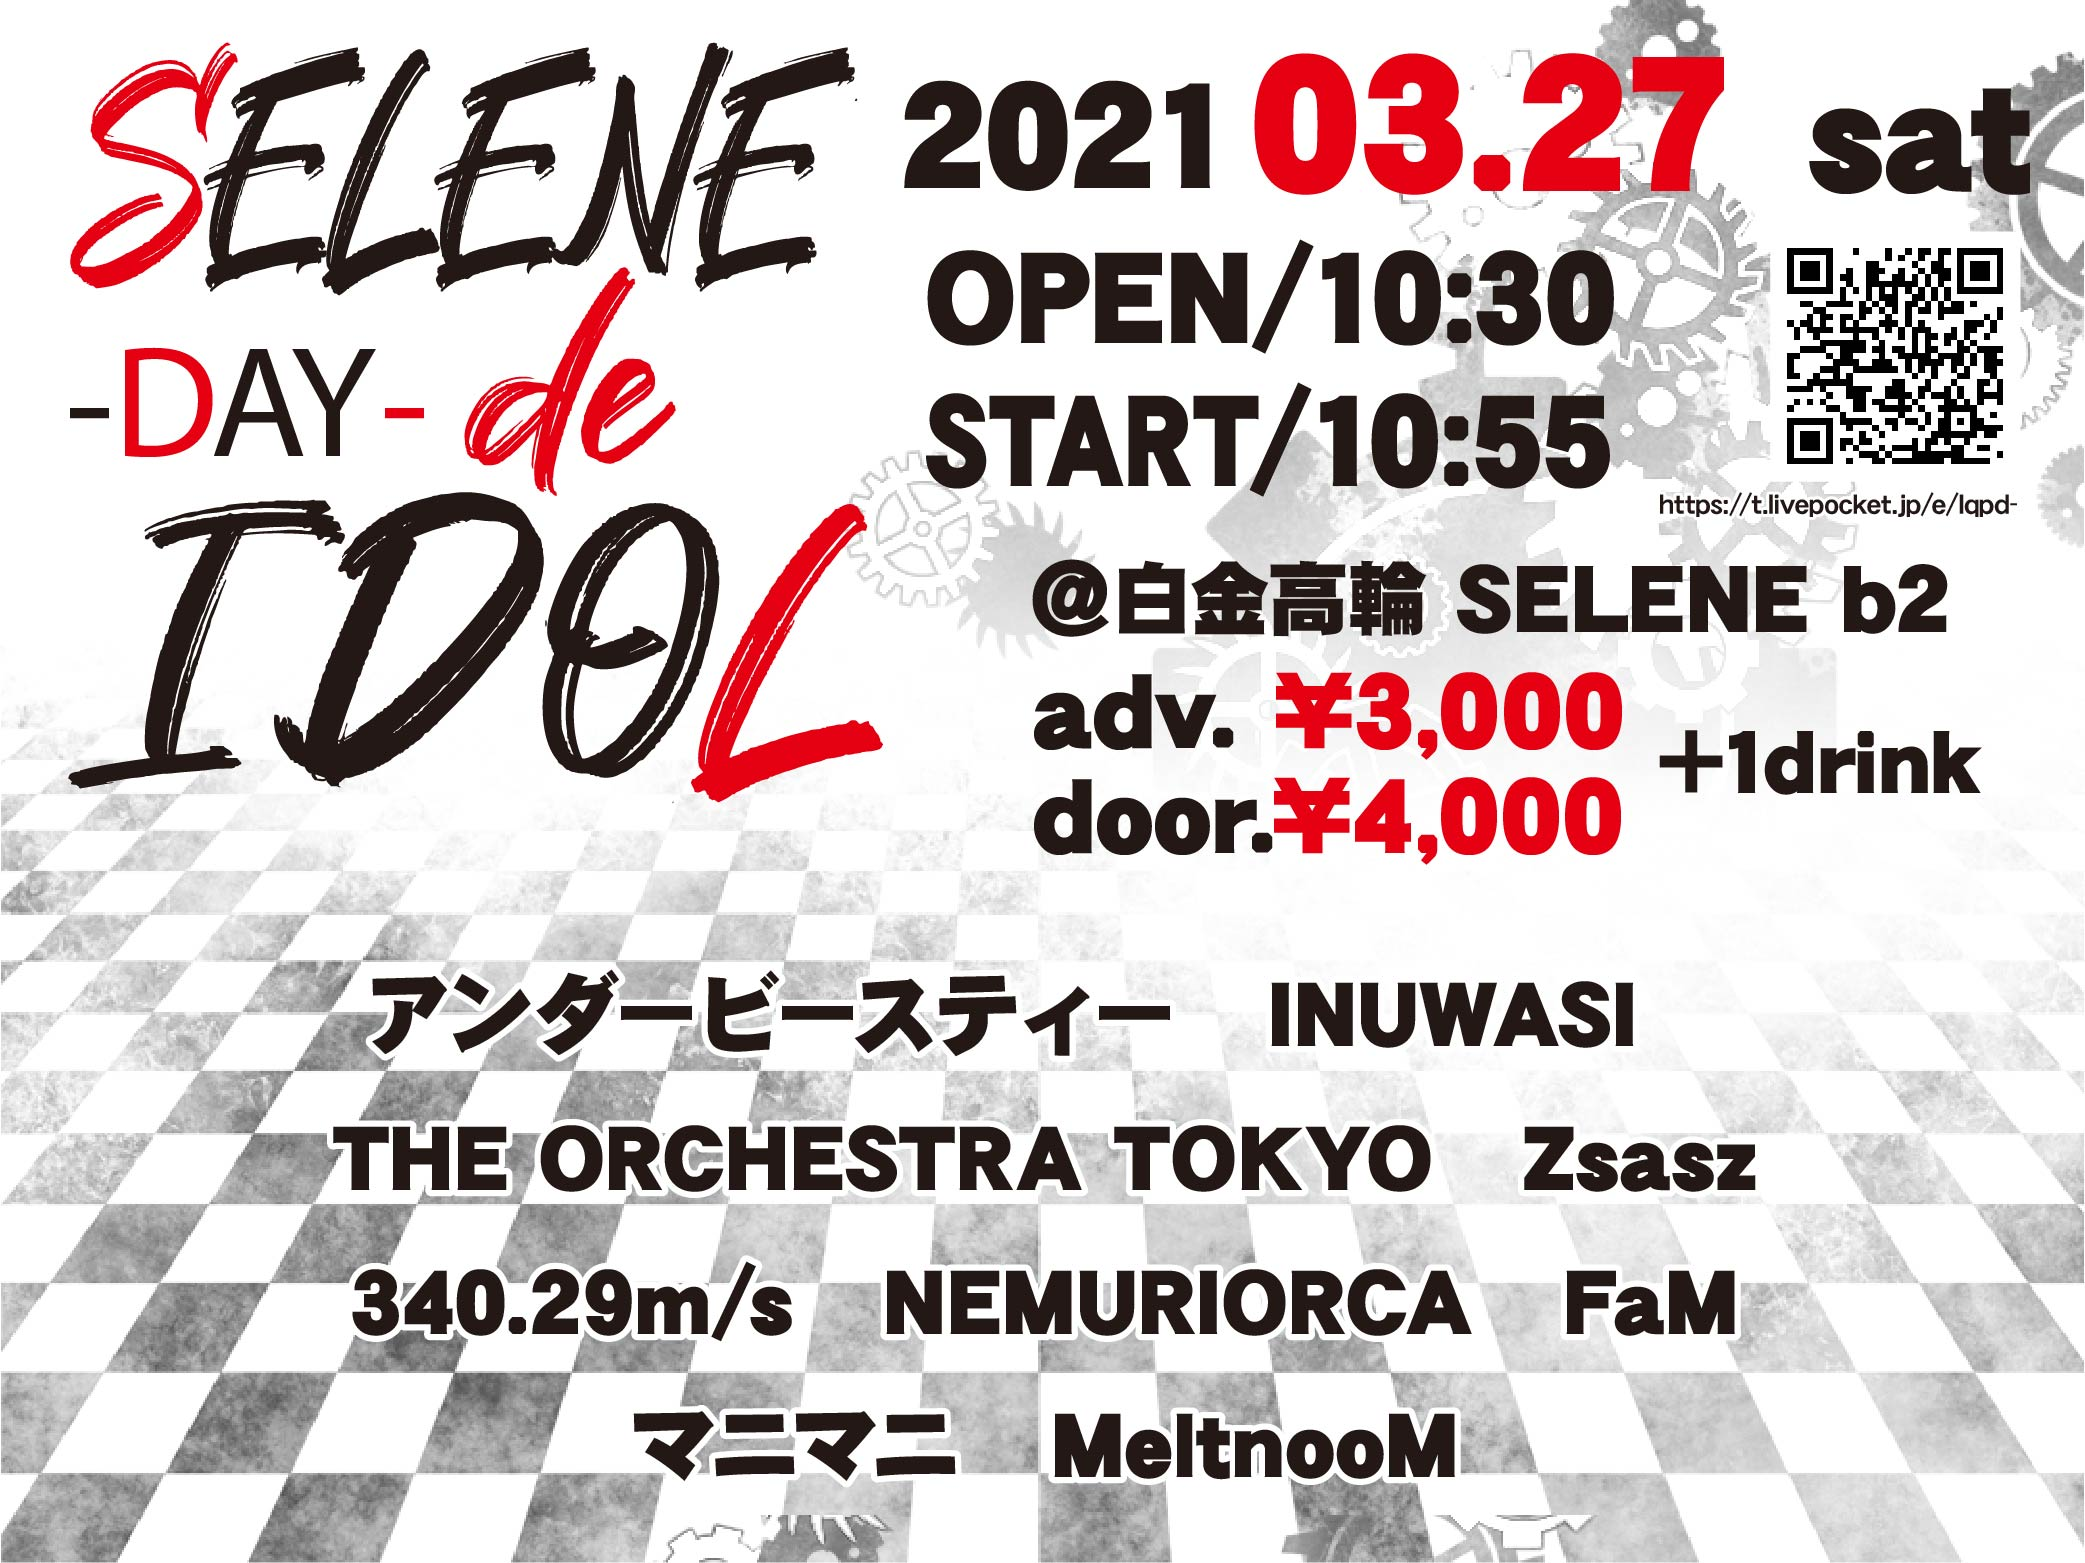 「SELENE de IDOL〜DAY〜」